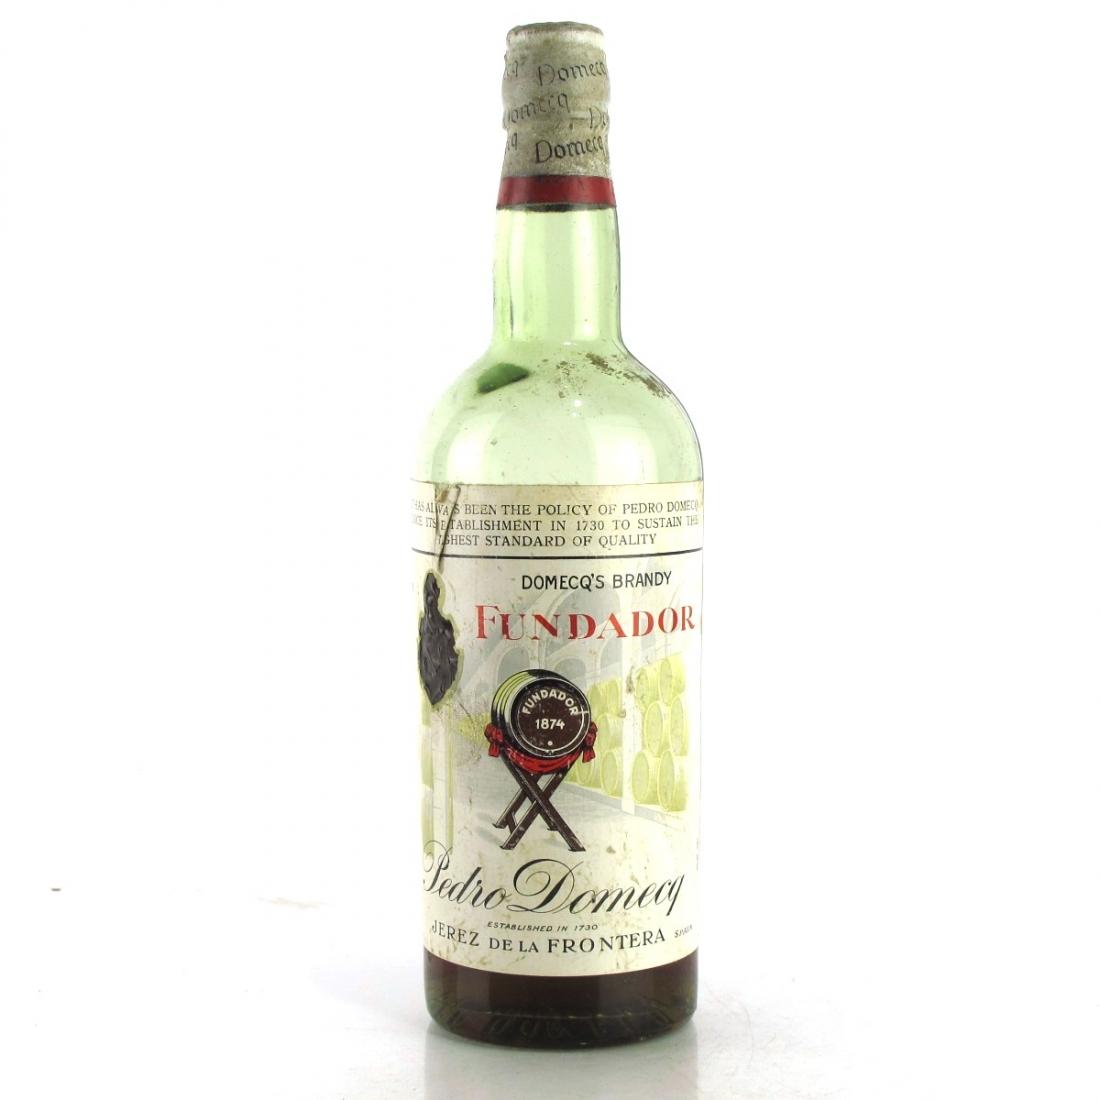 Fundador Pedro Domecq Brandy 1960s